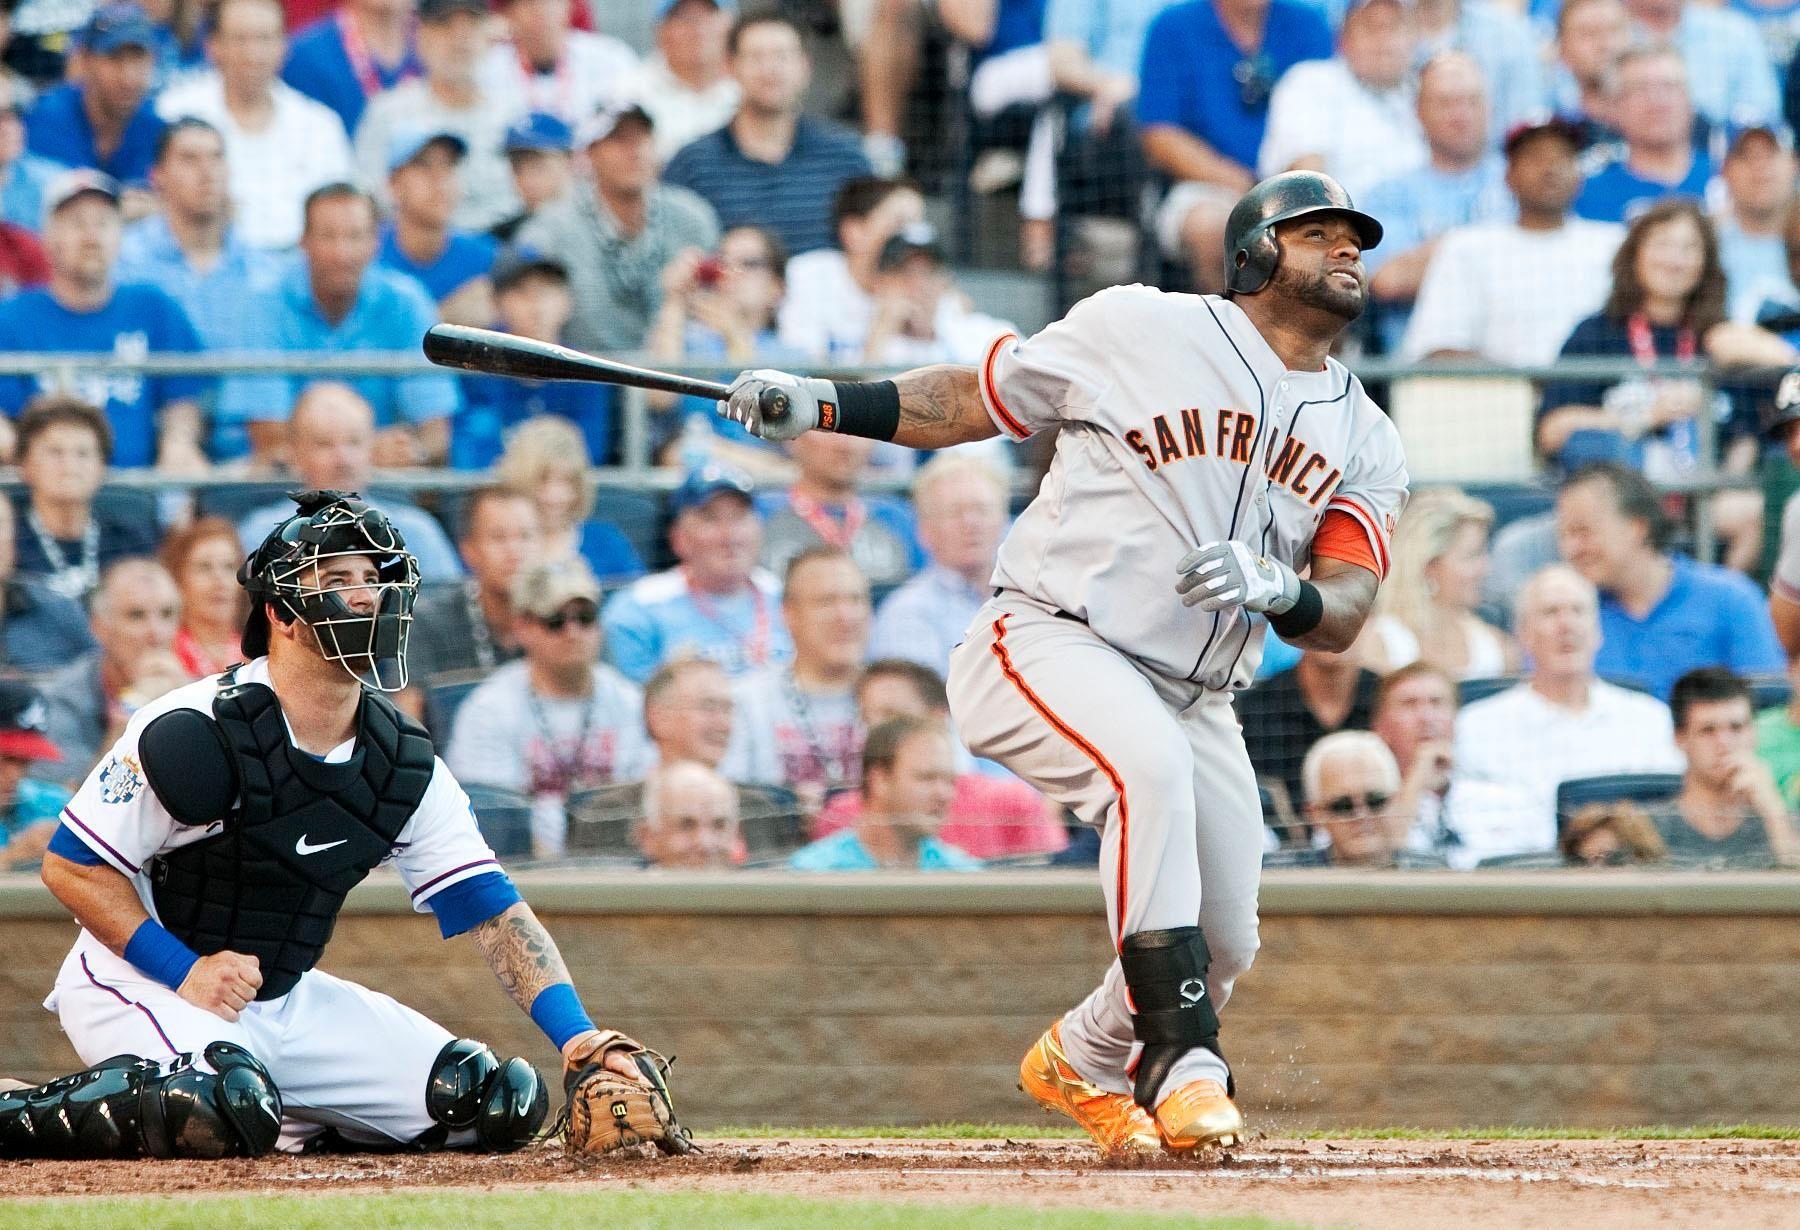 MLB facebook  Giants coming up big as it's 8-0 NL after 4. http://atmlb.com/PKrK8k